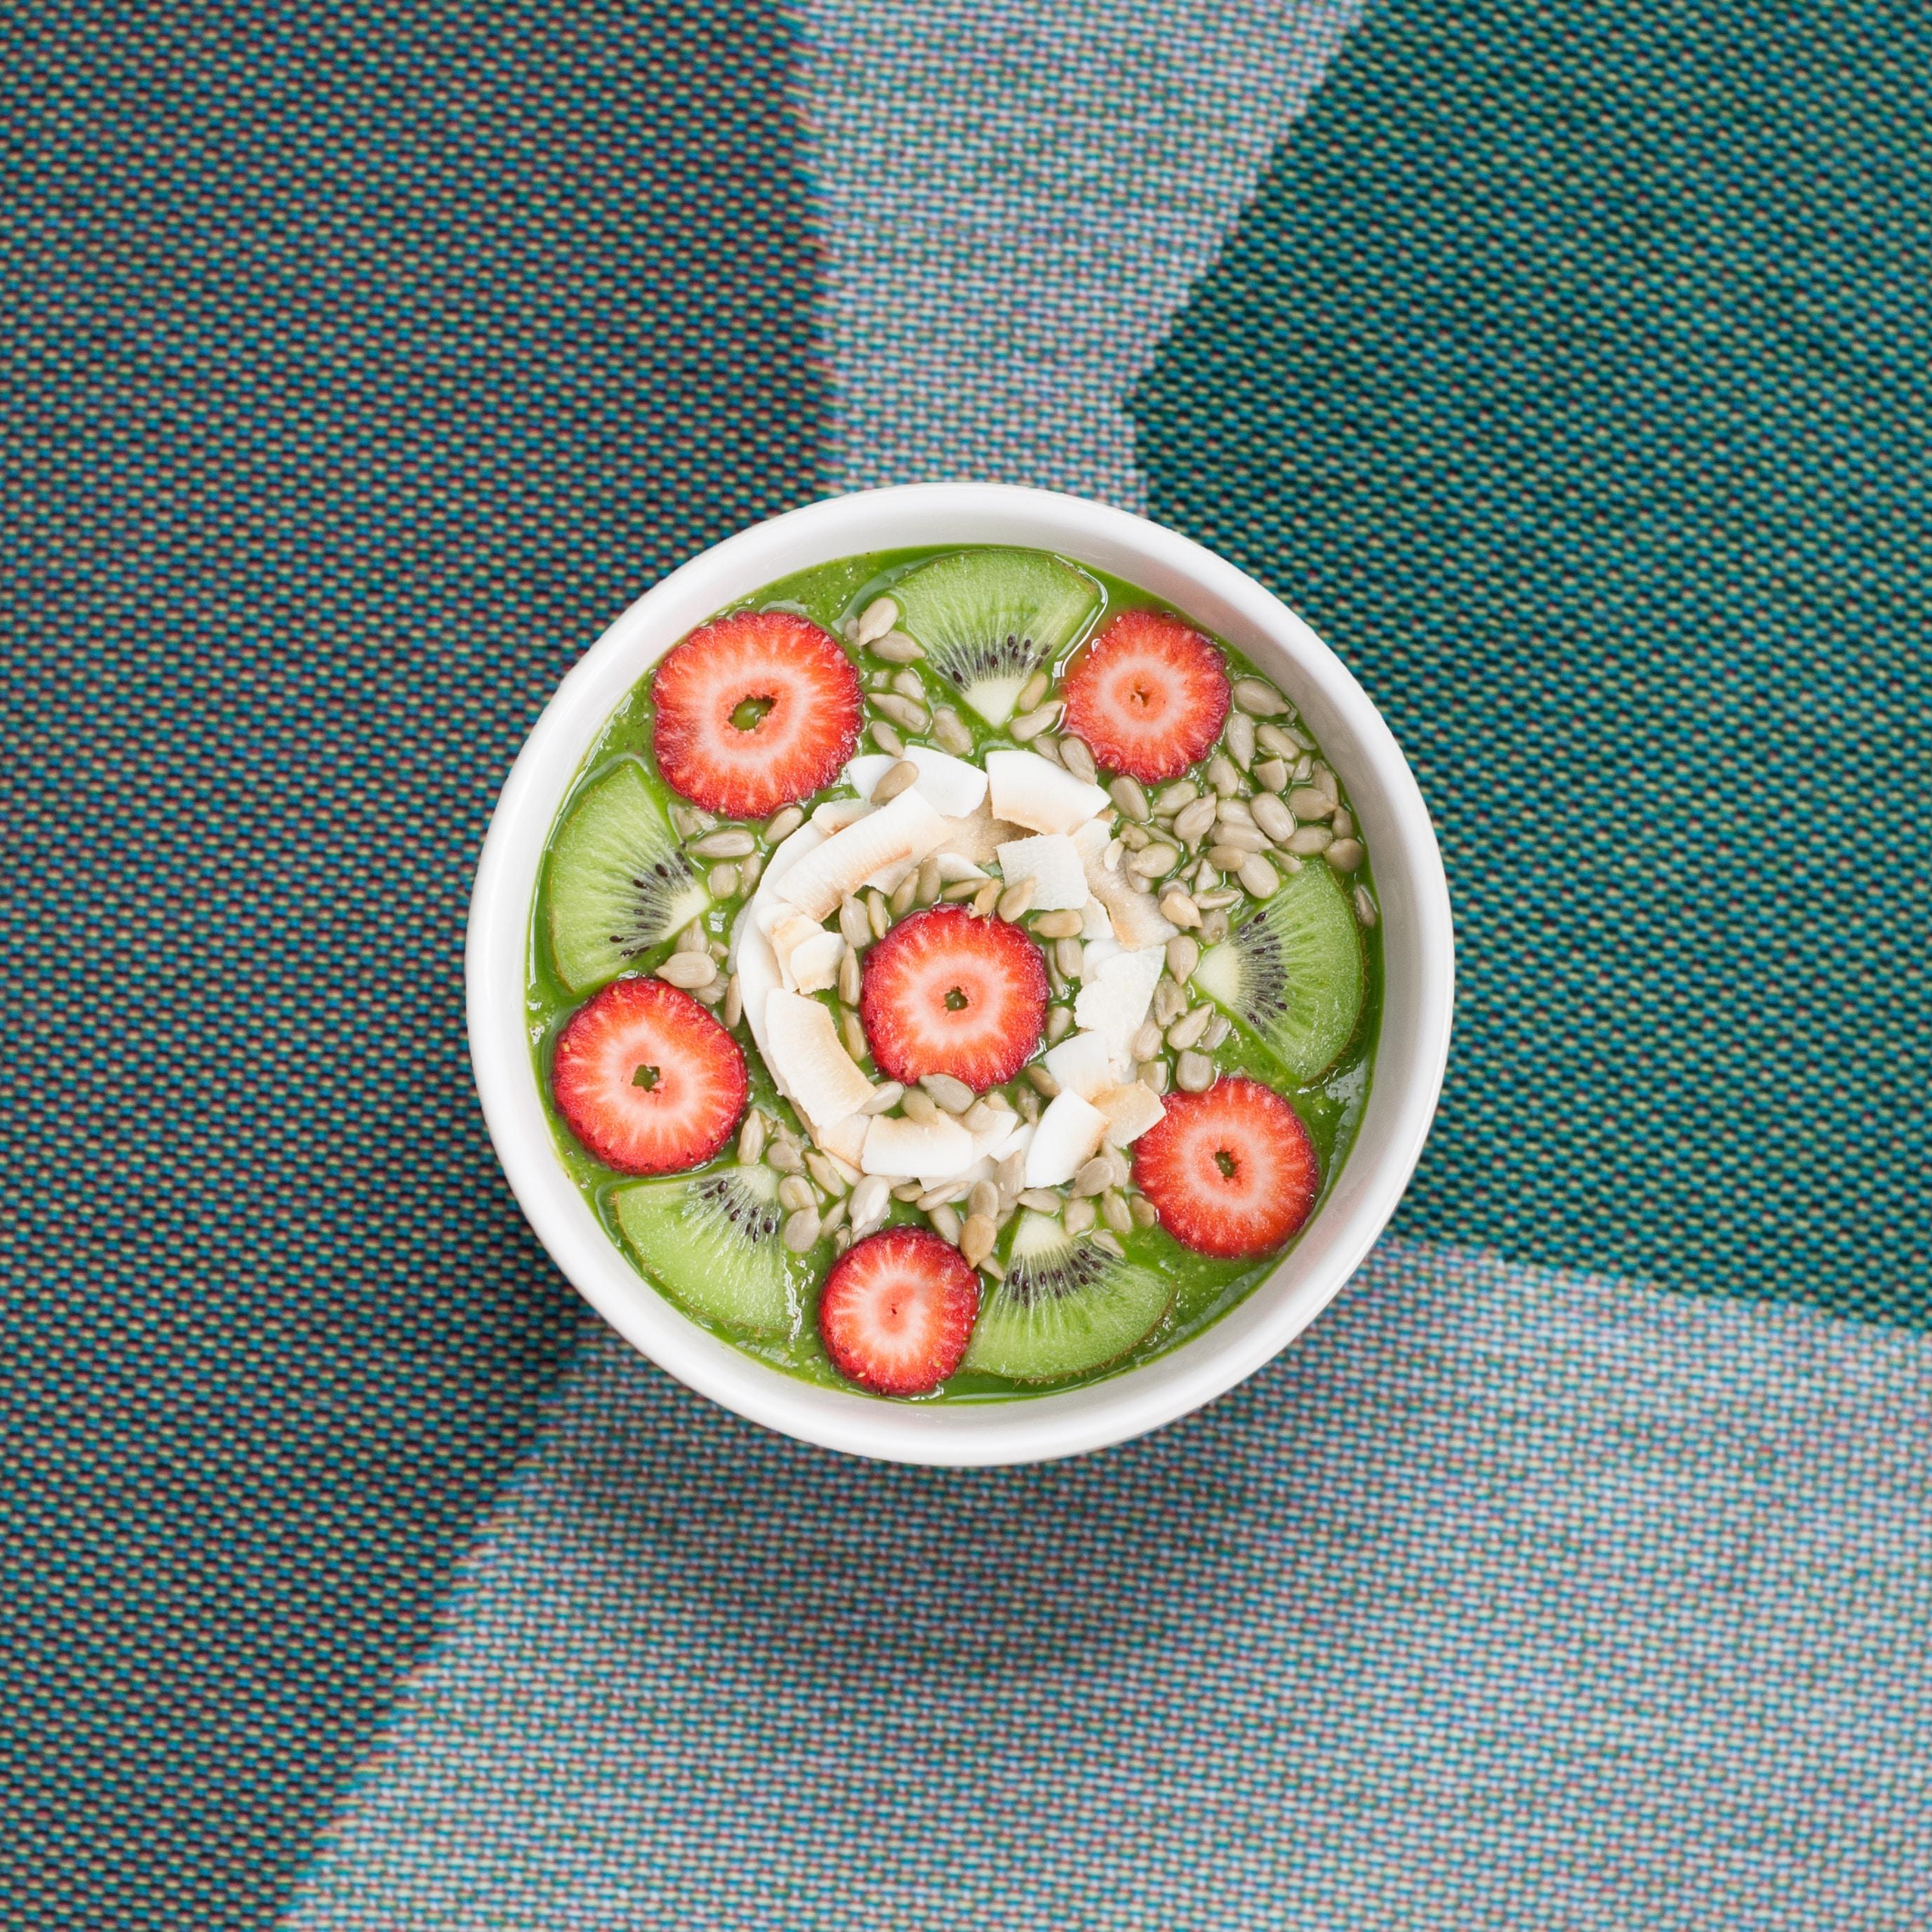 A bowl of kiwi, strawberries, and granola